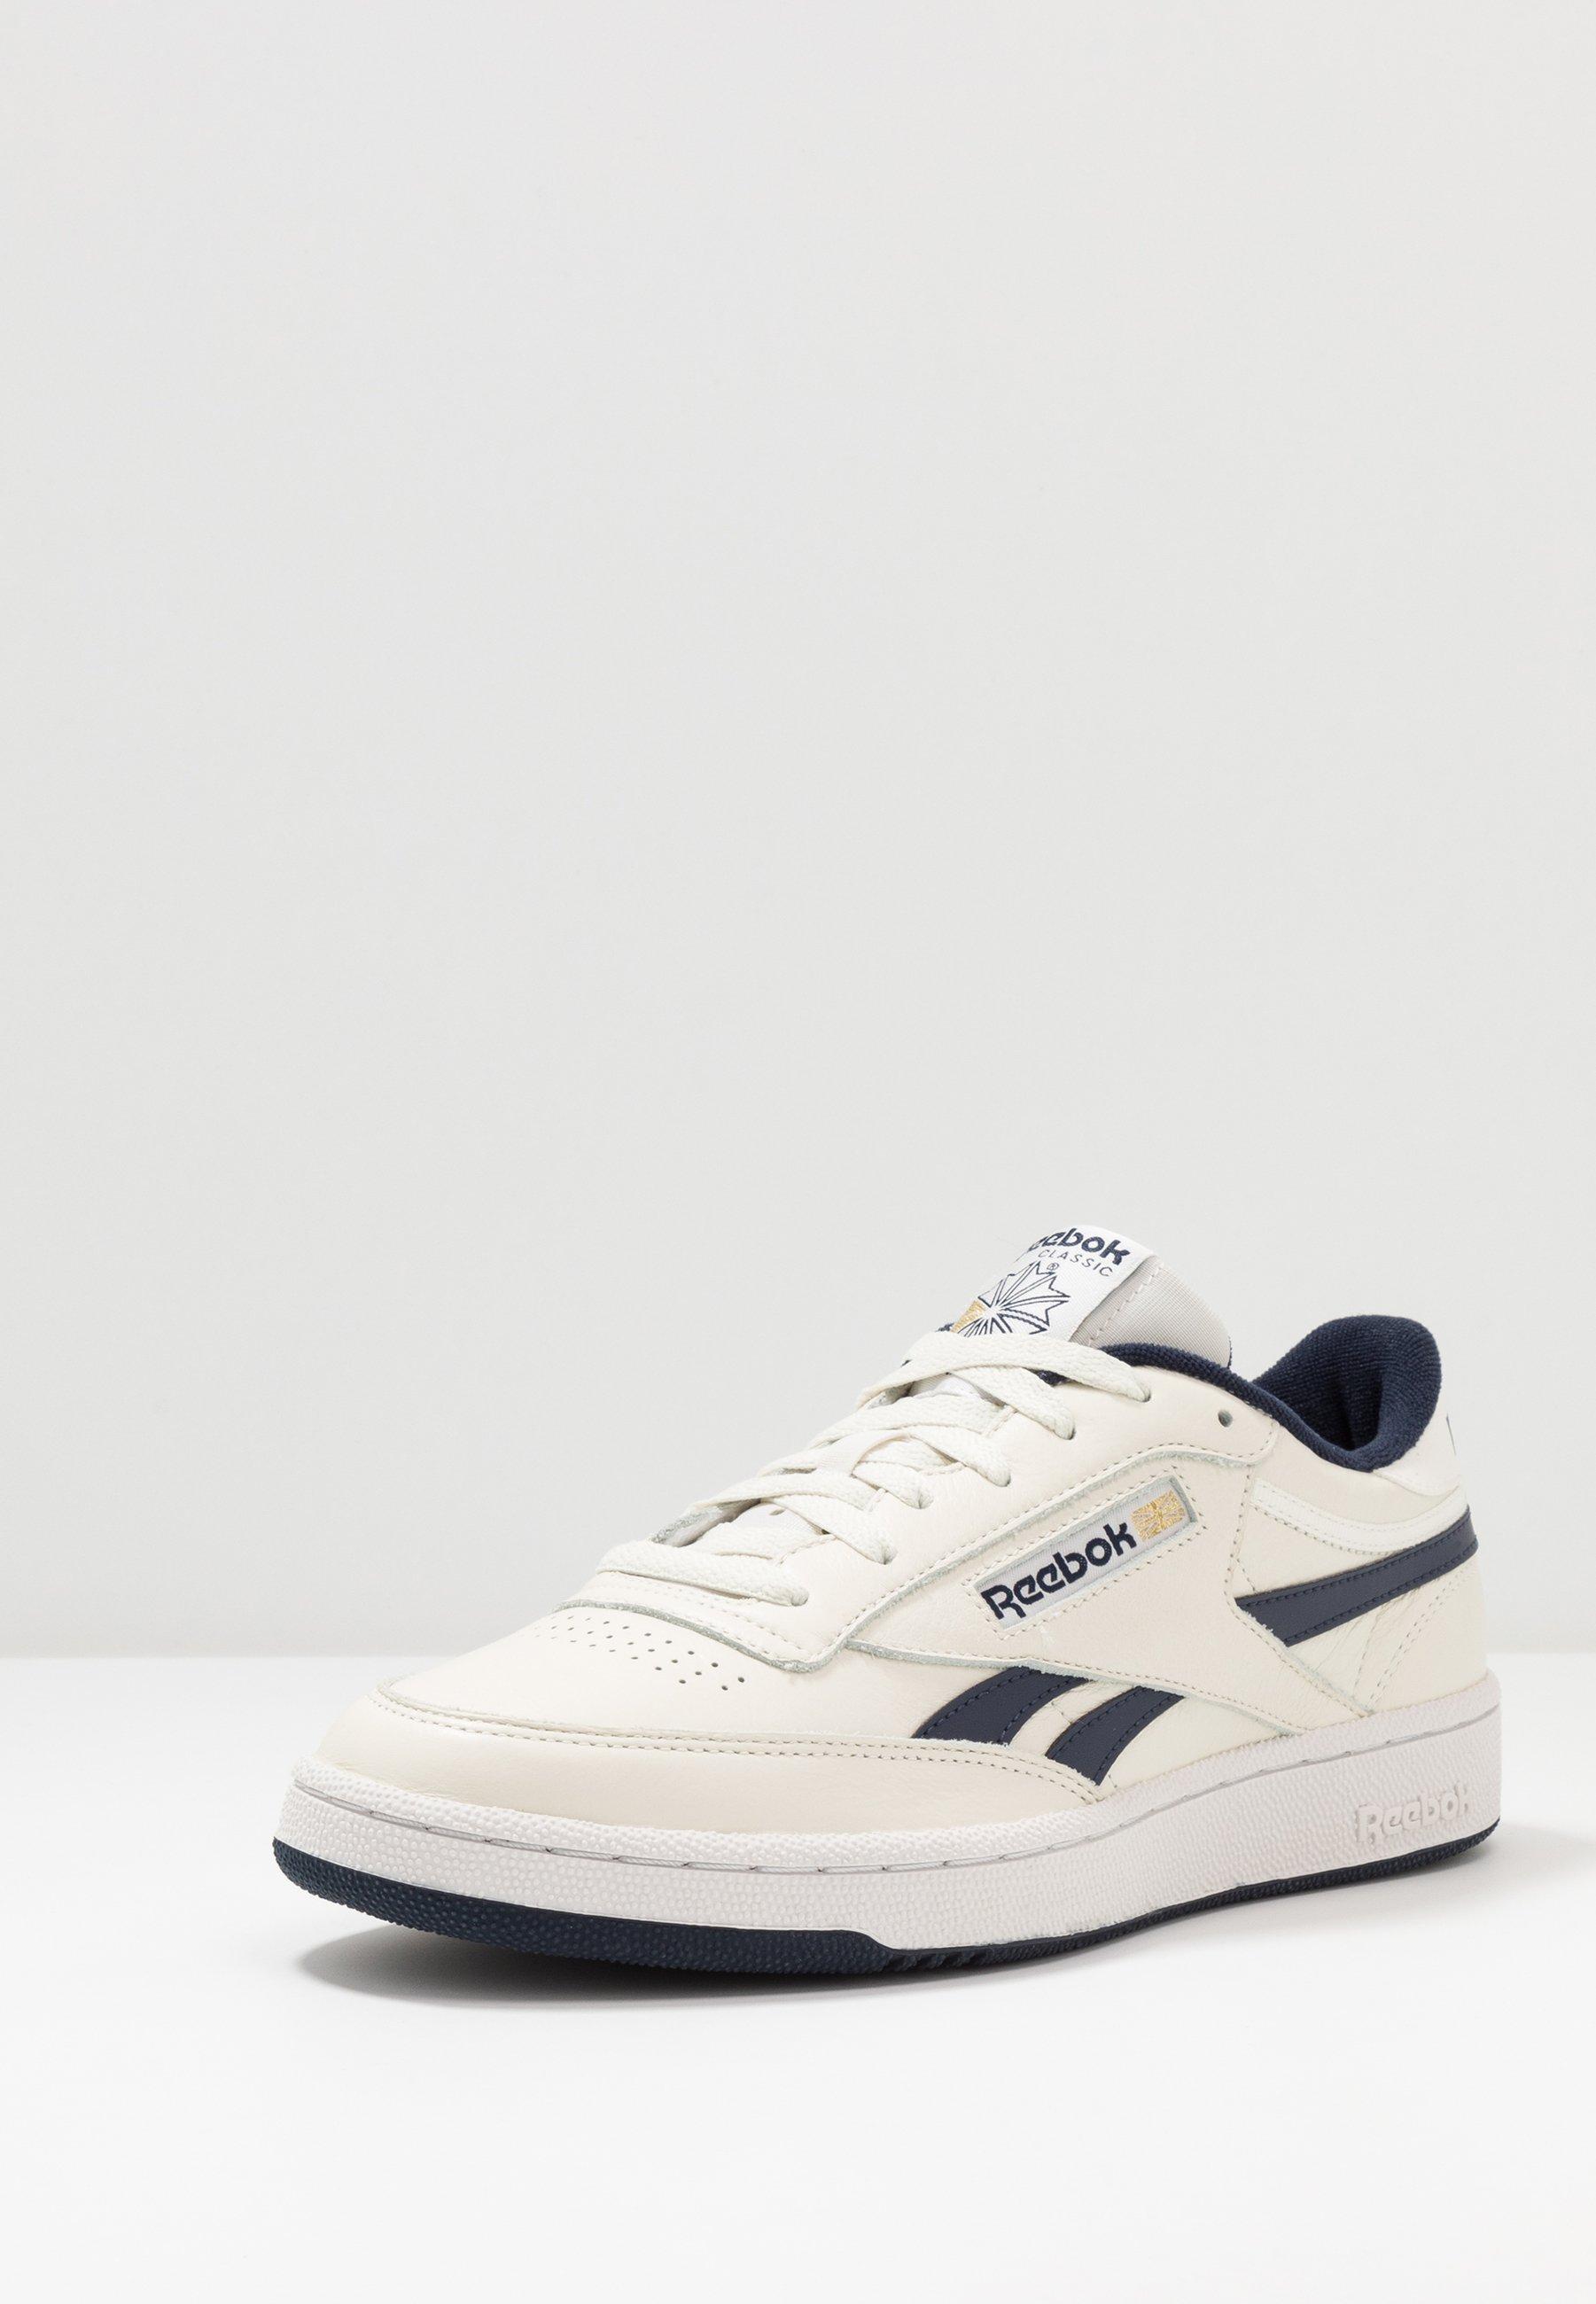 Reebok Classic CLUB REVENGE Sneaker low chalk/navy/porcel/offwhite